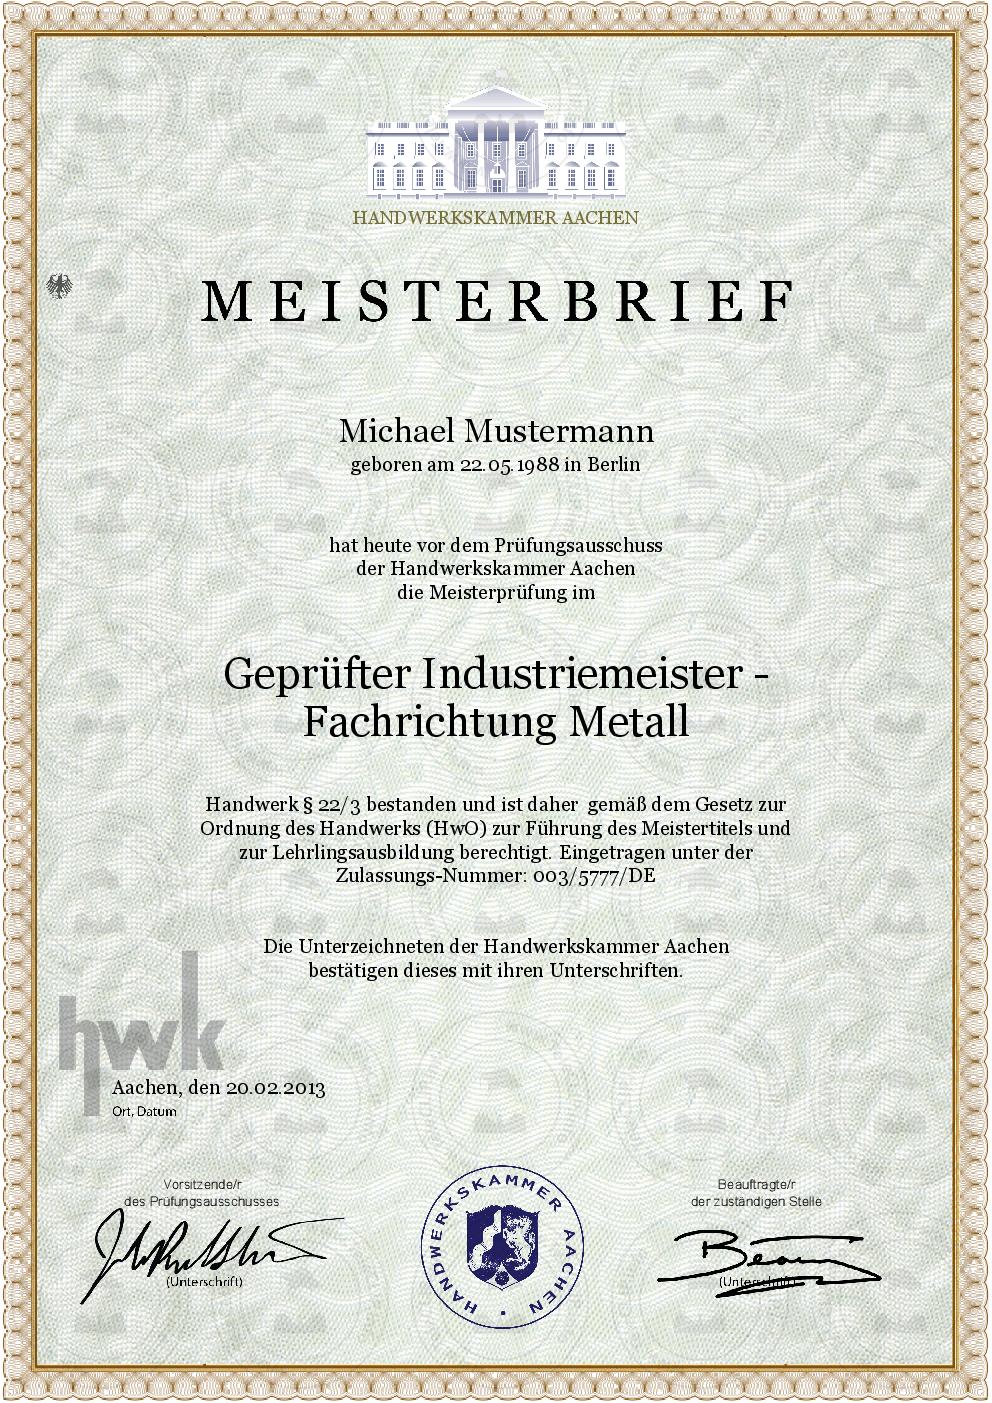 hwk_meisterbrief_14b